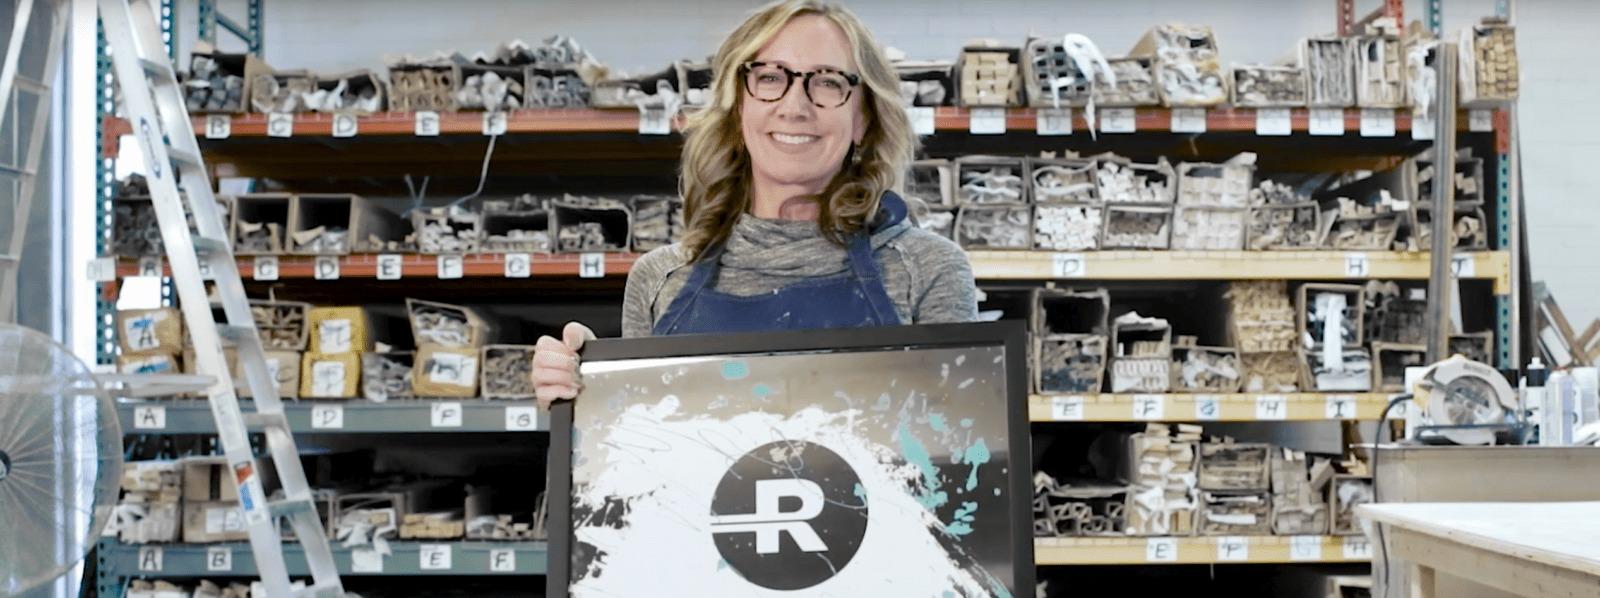 Stacy Milburn ships art with Roadie